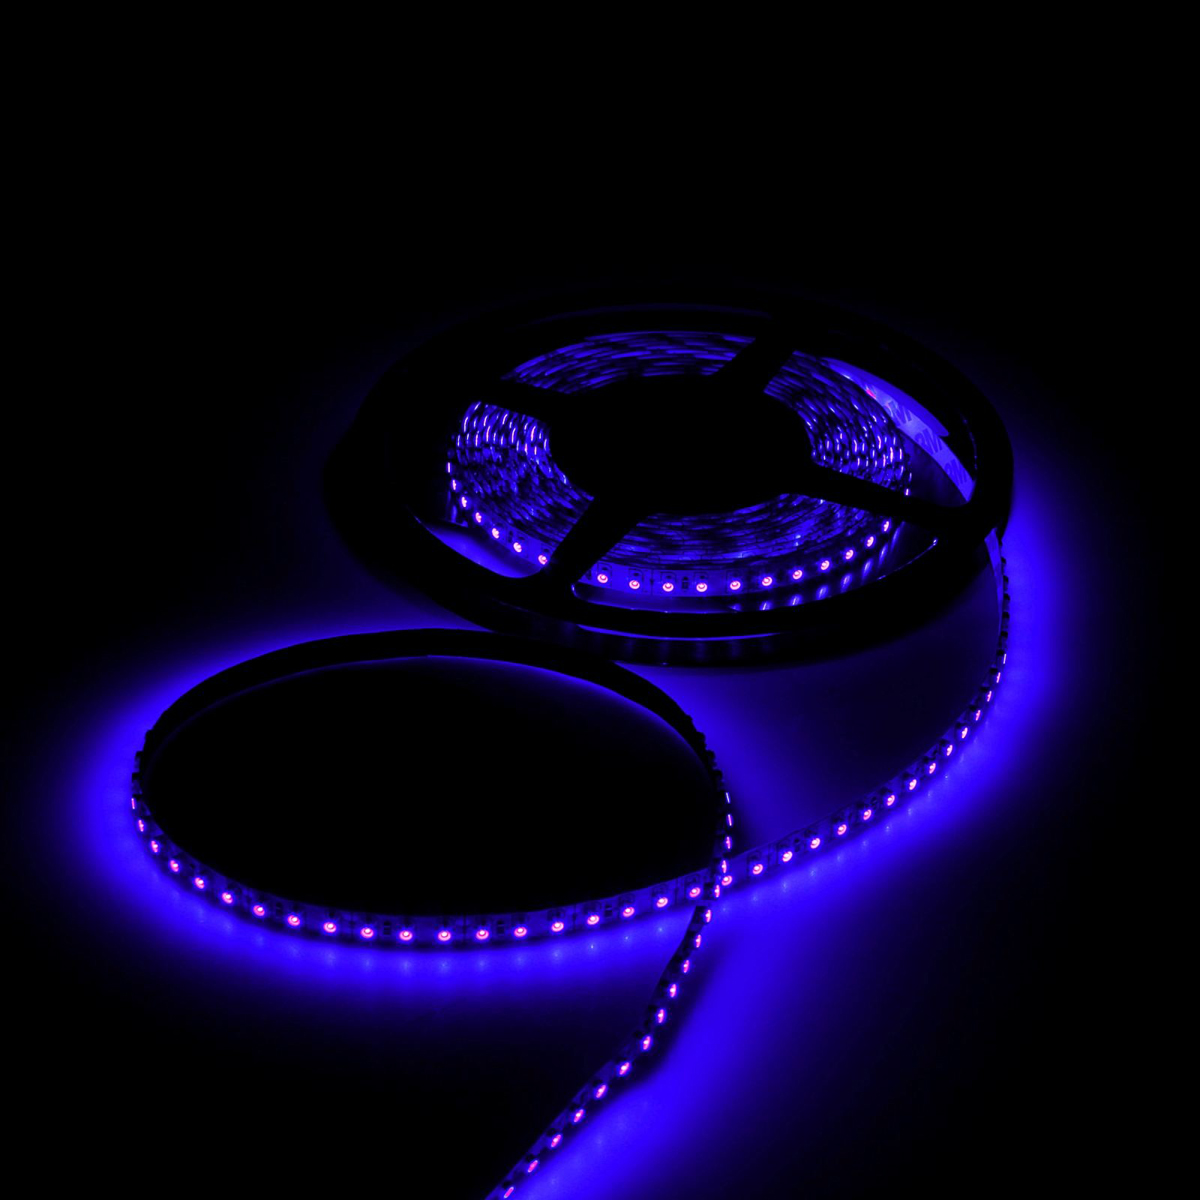 Светодиодная лента Luazon, 12В, SMD3528, длина 5 м, IP33, 120 LED ламп, 9.6 Вт/м, 6-7 Лм/1 LED, DC, цвет: синий. 883896 светодиодная лента luazon 12в smd3528 длина 5 м ip68 60 led ламп 4 8 вт м 6 7 лм 1 led dc цвет фиолетовый